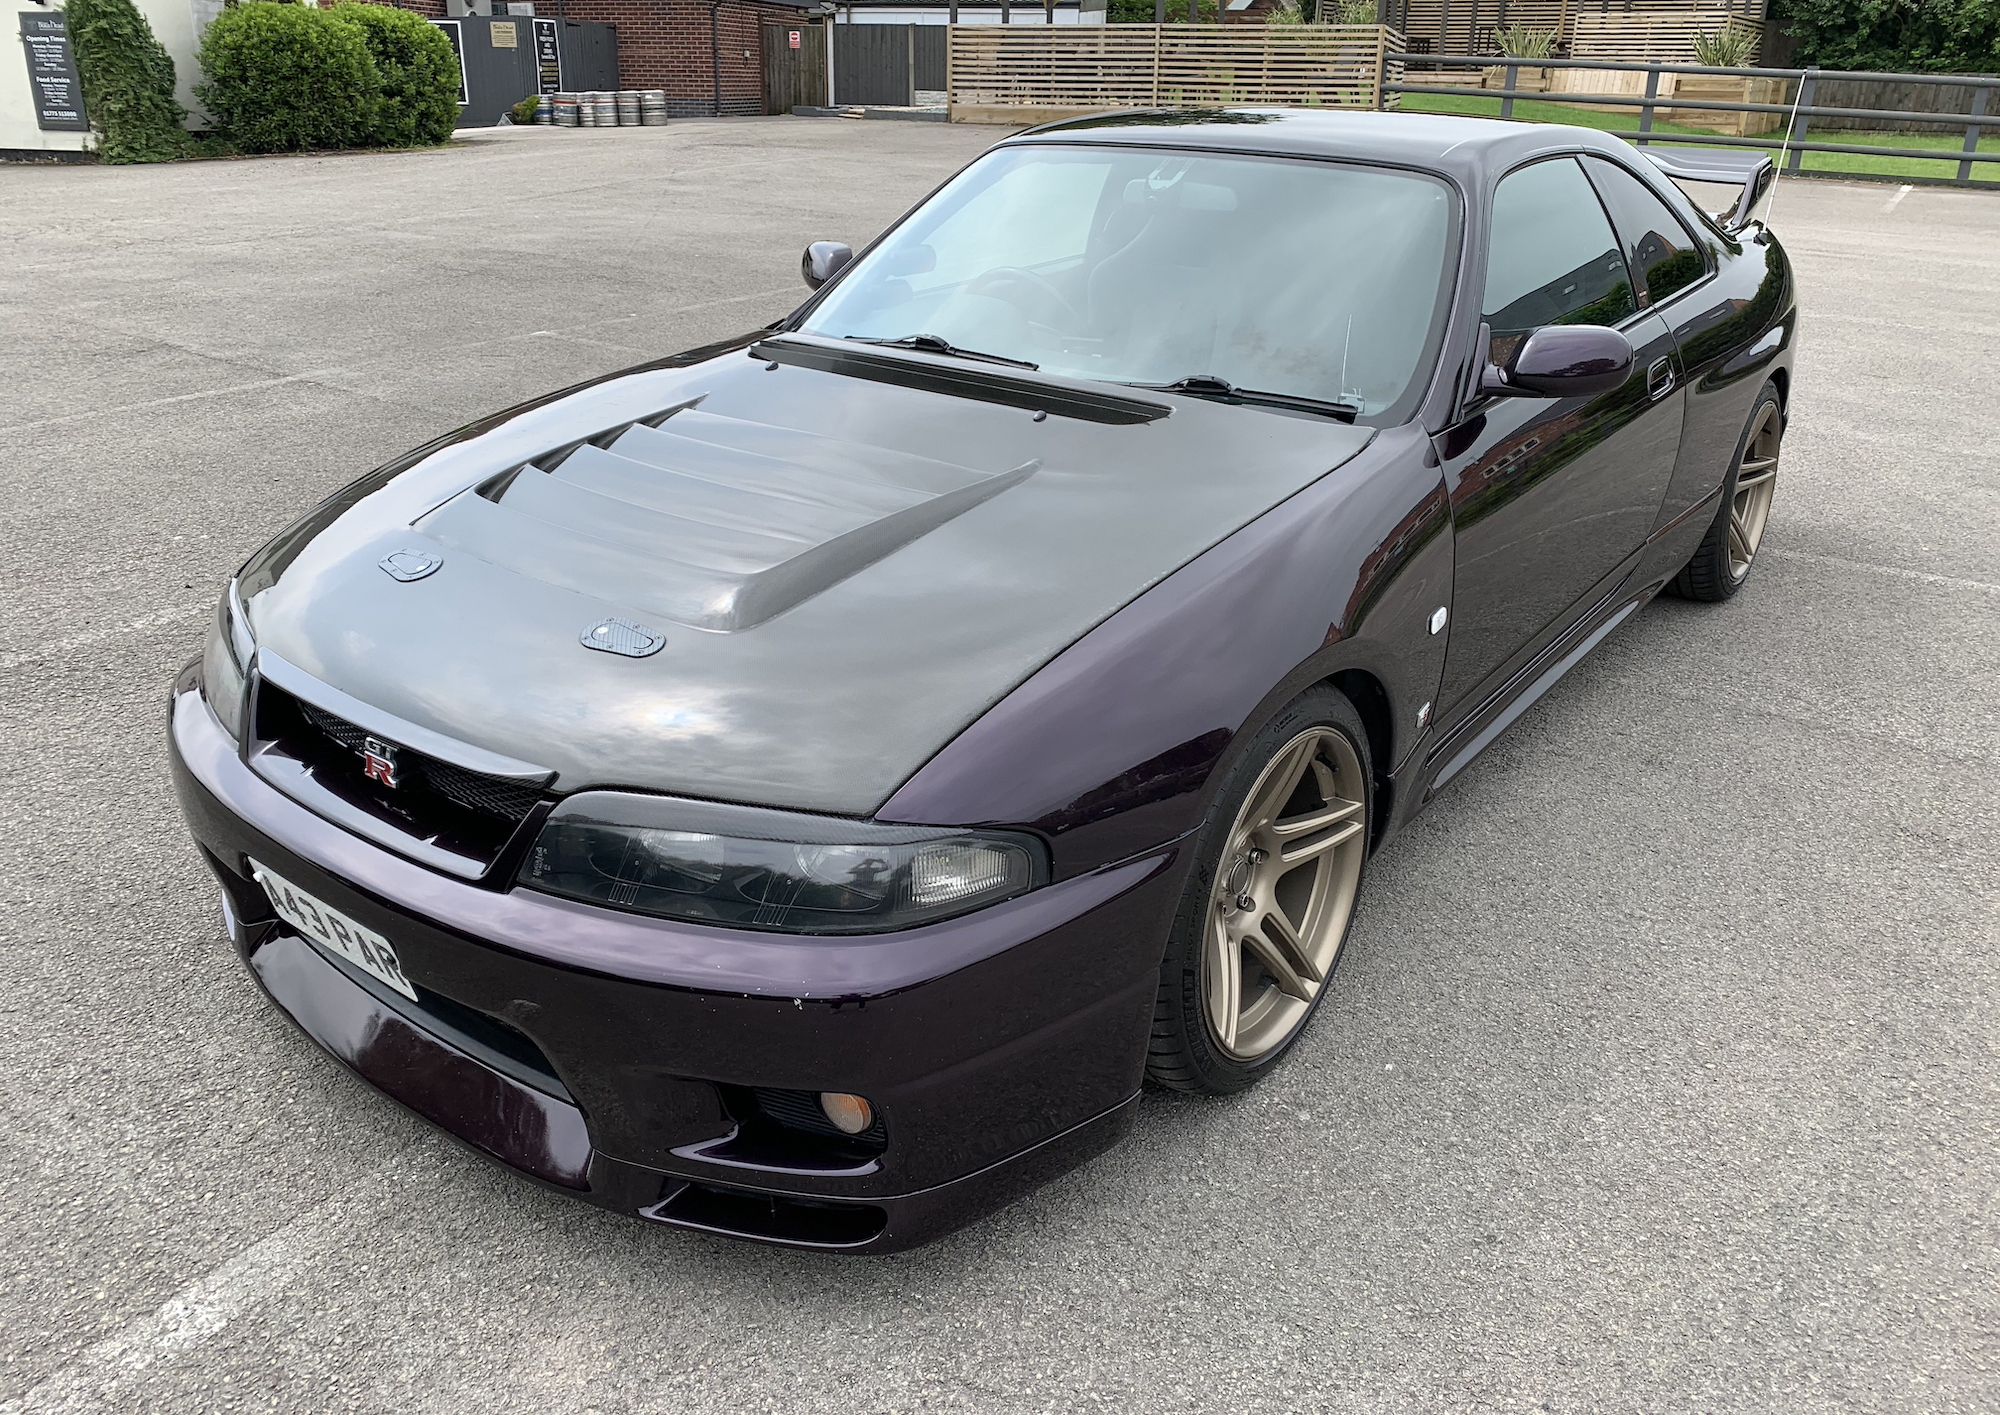 1996 NISSAN SKYLINE (R33) GT-R